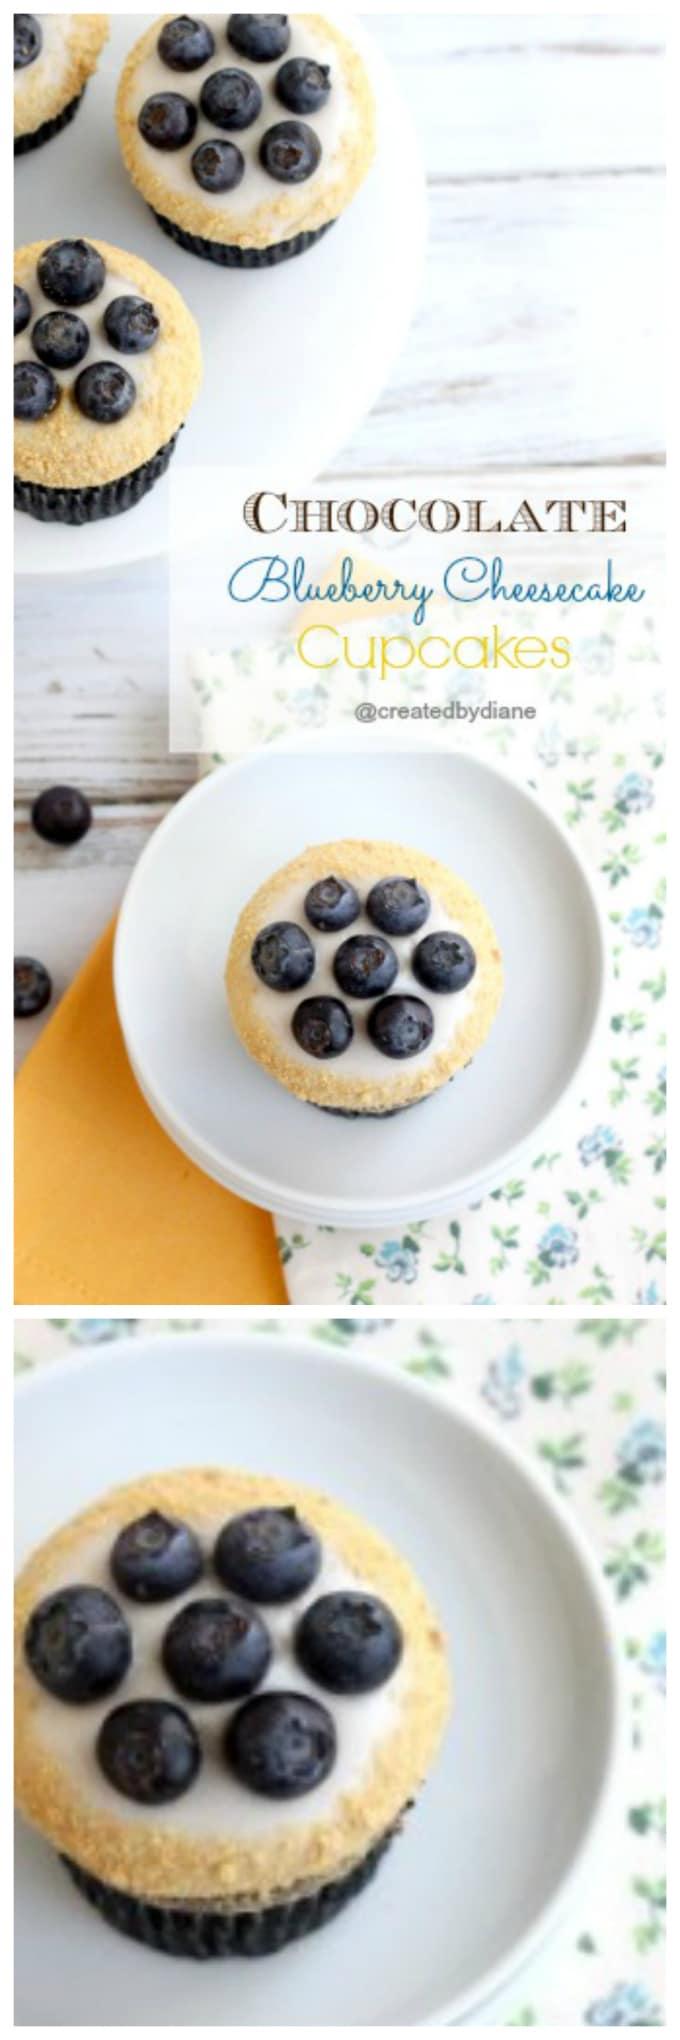 chocolate blueberry cheesecake cupcakes @createdbydiane